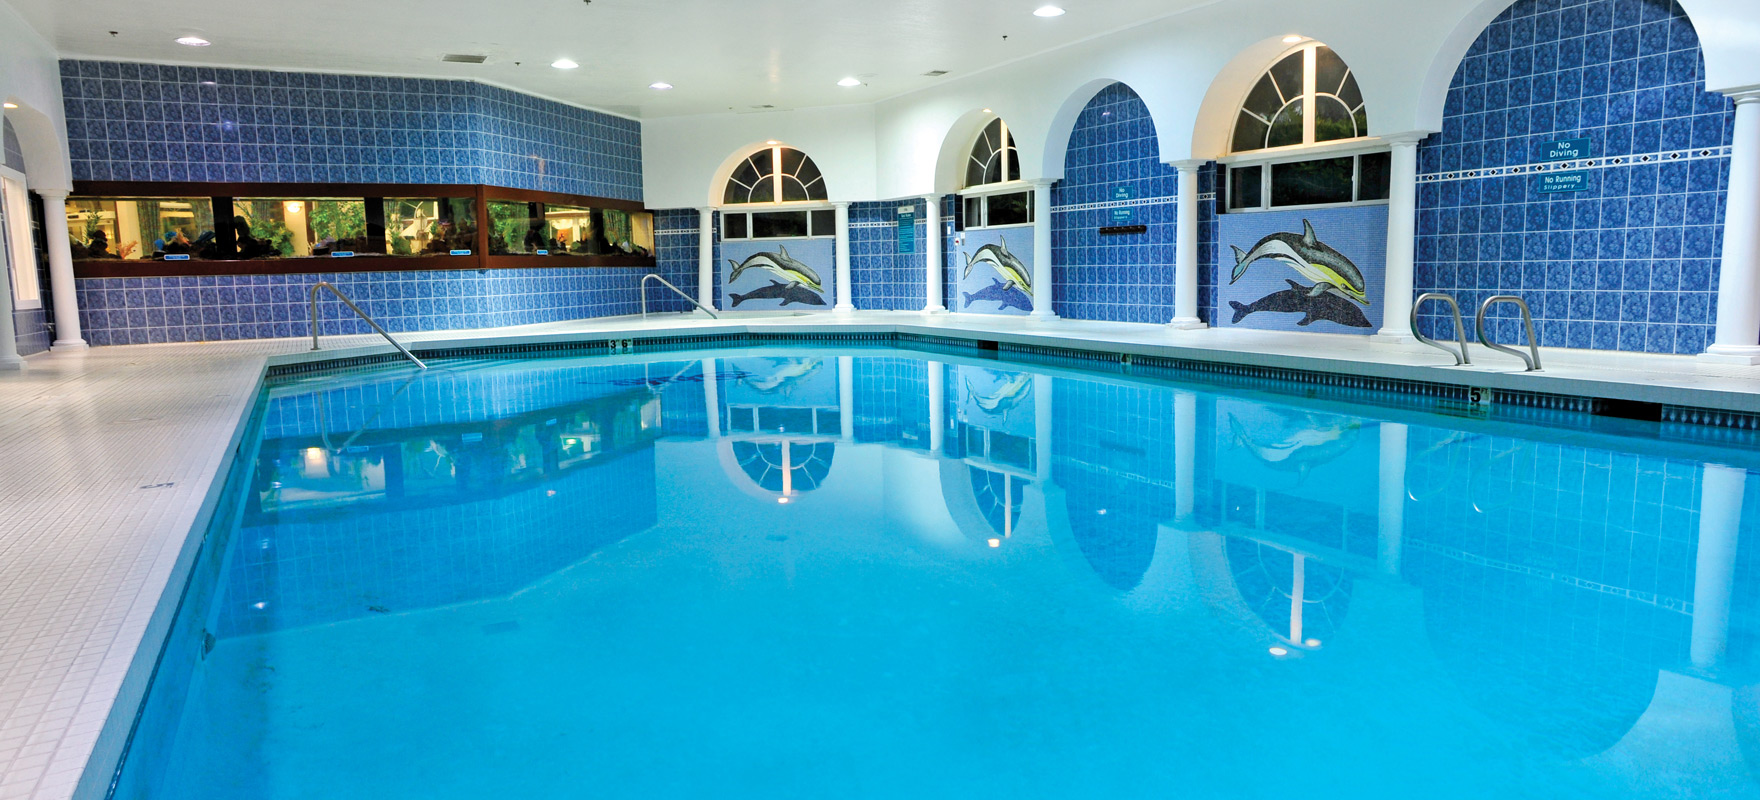 shilo inns suites hotels ocean shores washington. Black Bedroom Furniture Sets. Home Design Ideas